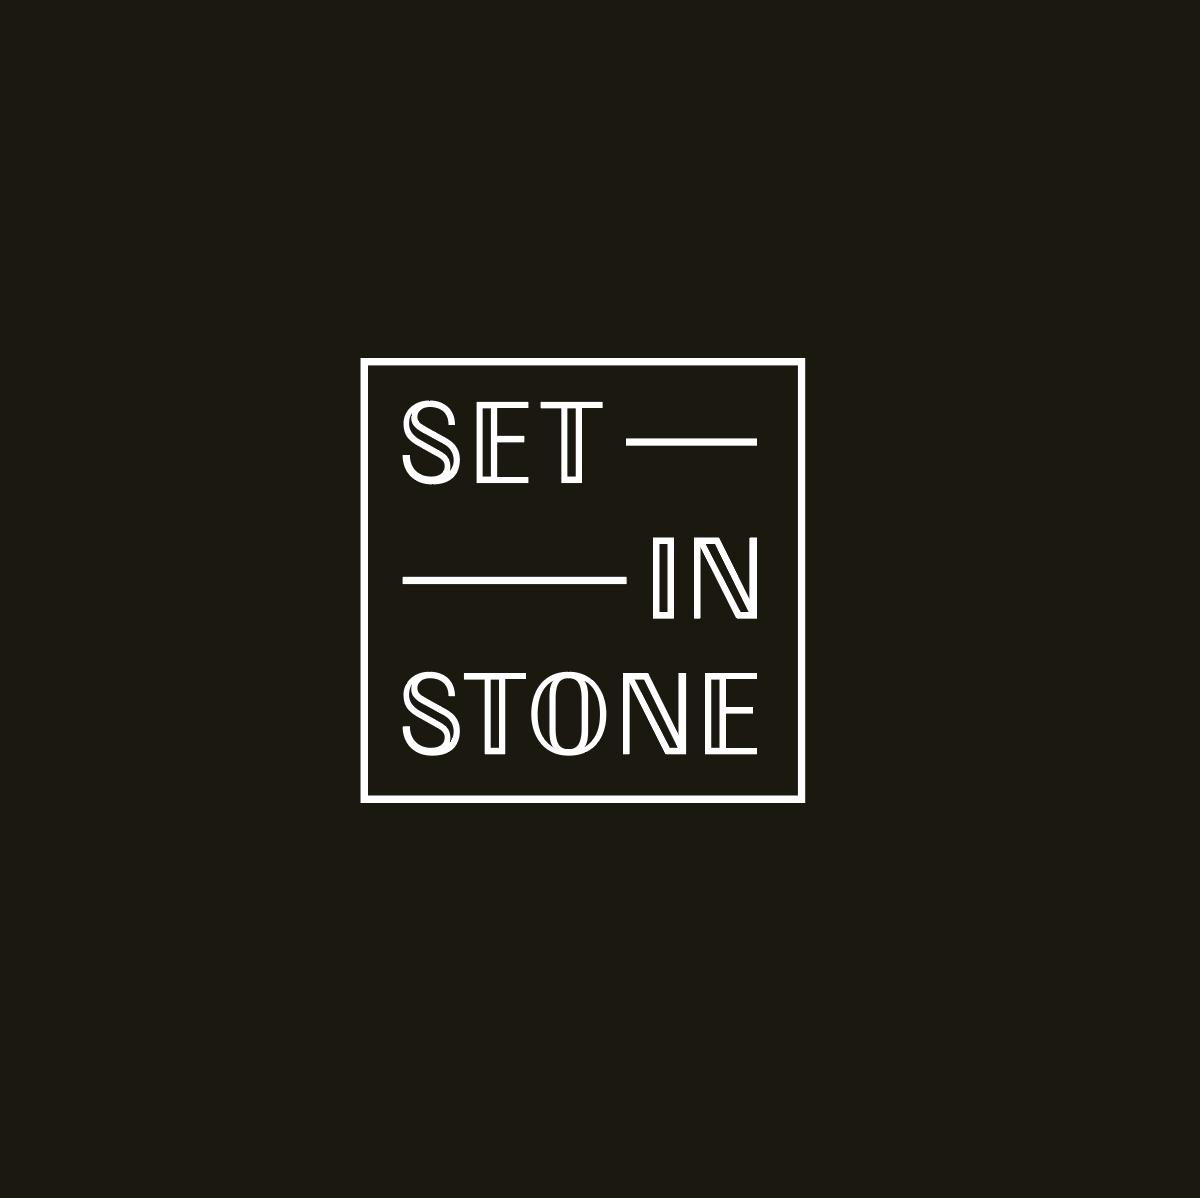 setinstone